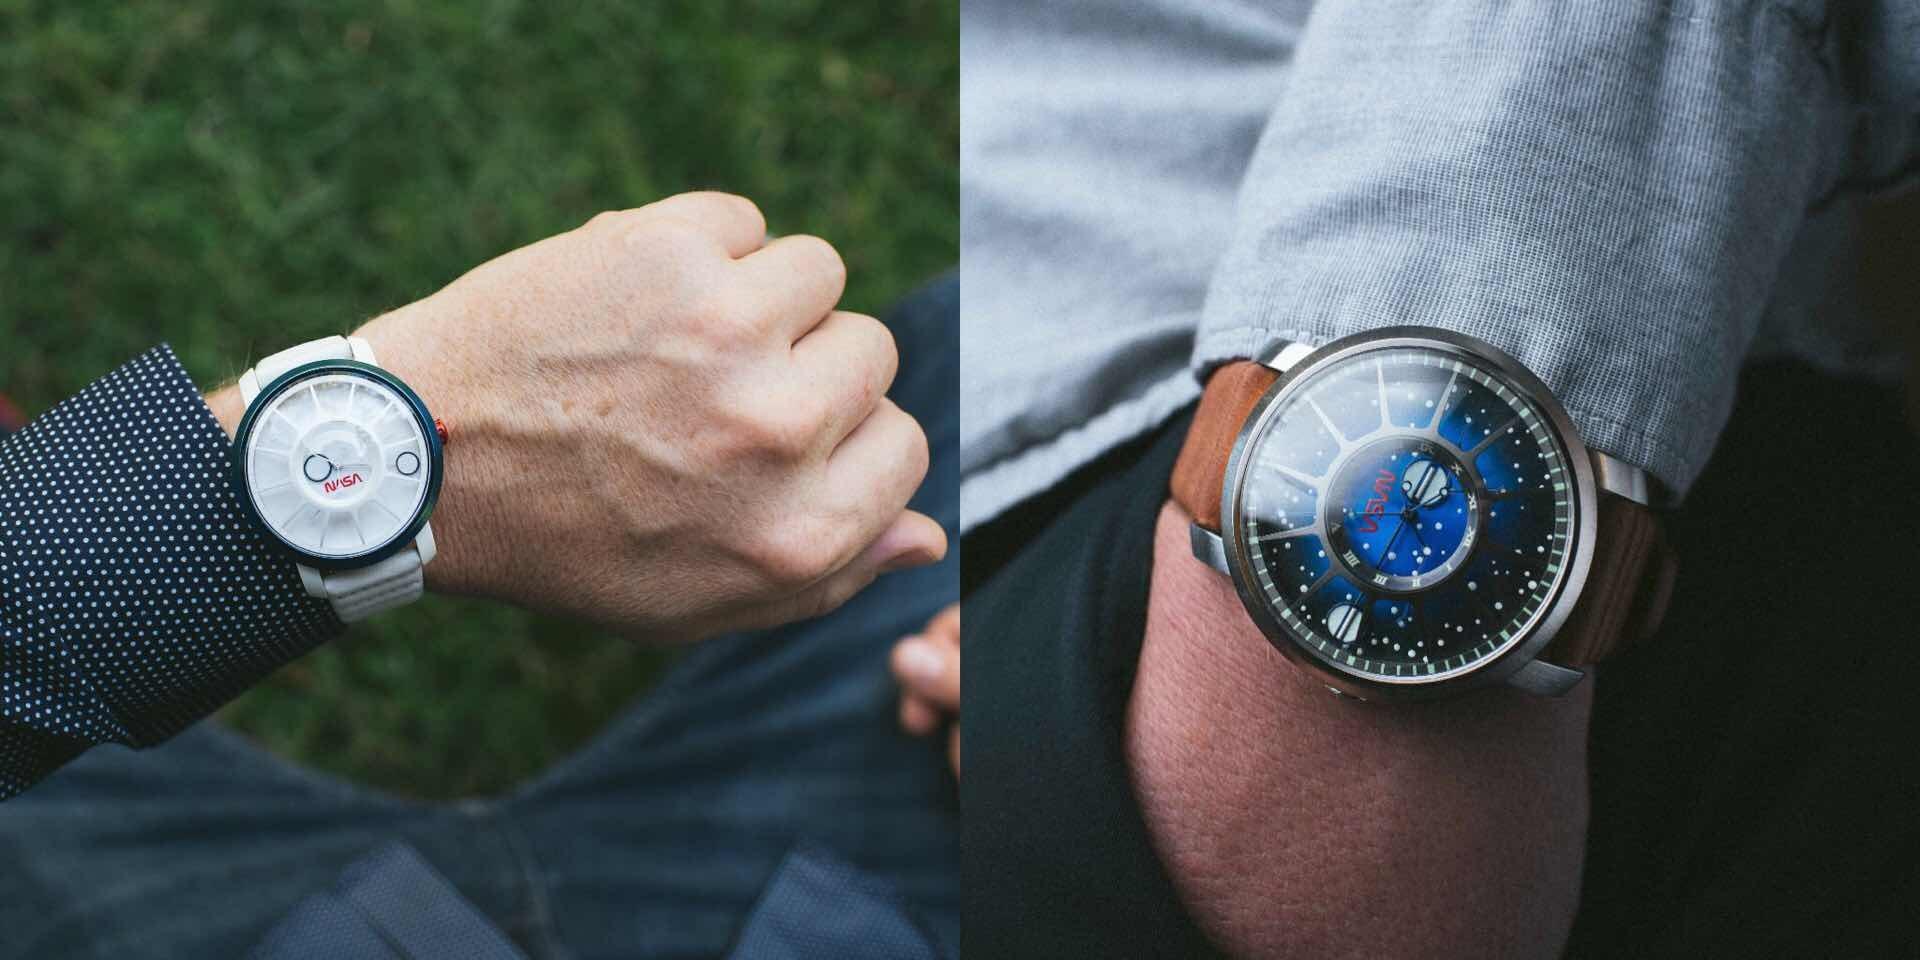 xeric-trappist-1-nasa-edition-automatic-watches-kickstarter-2